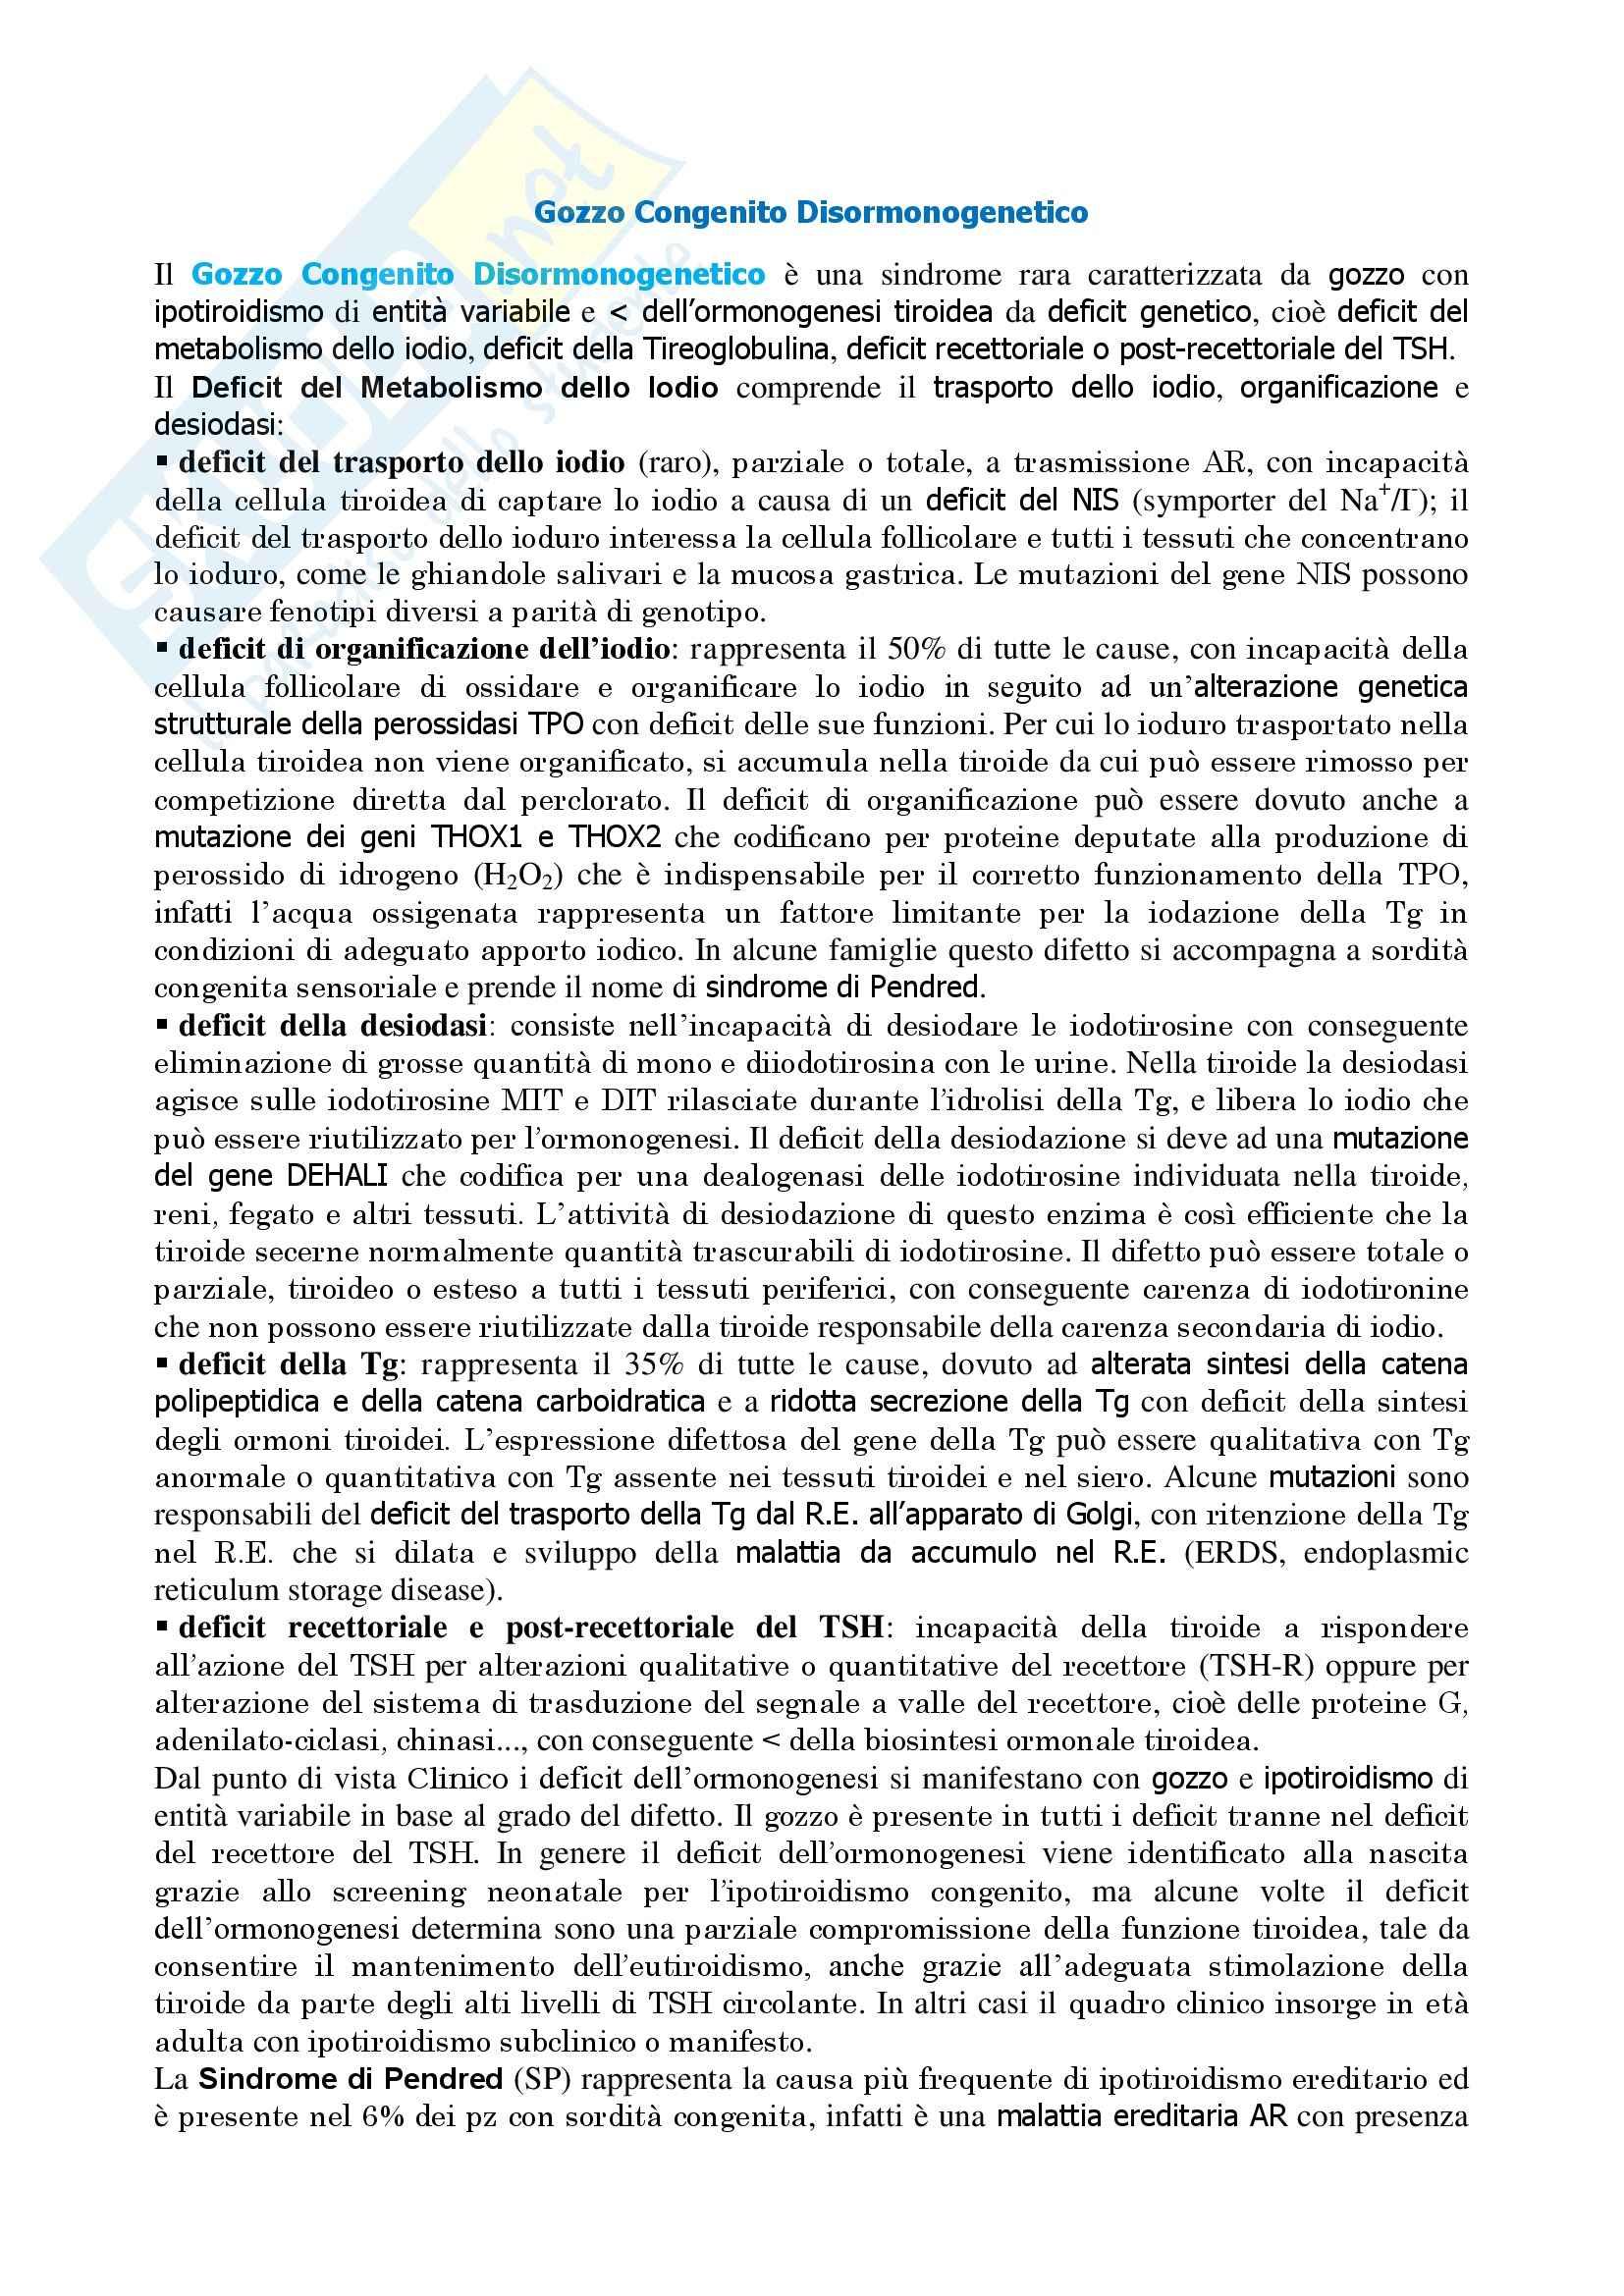 Endocrinologia - gozzo congenito disormonogenetico